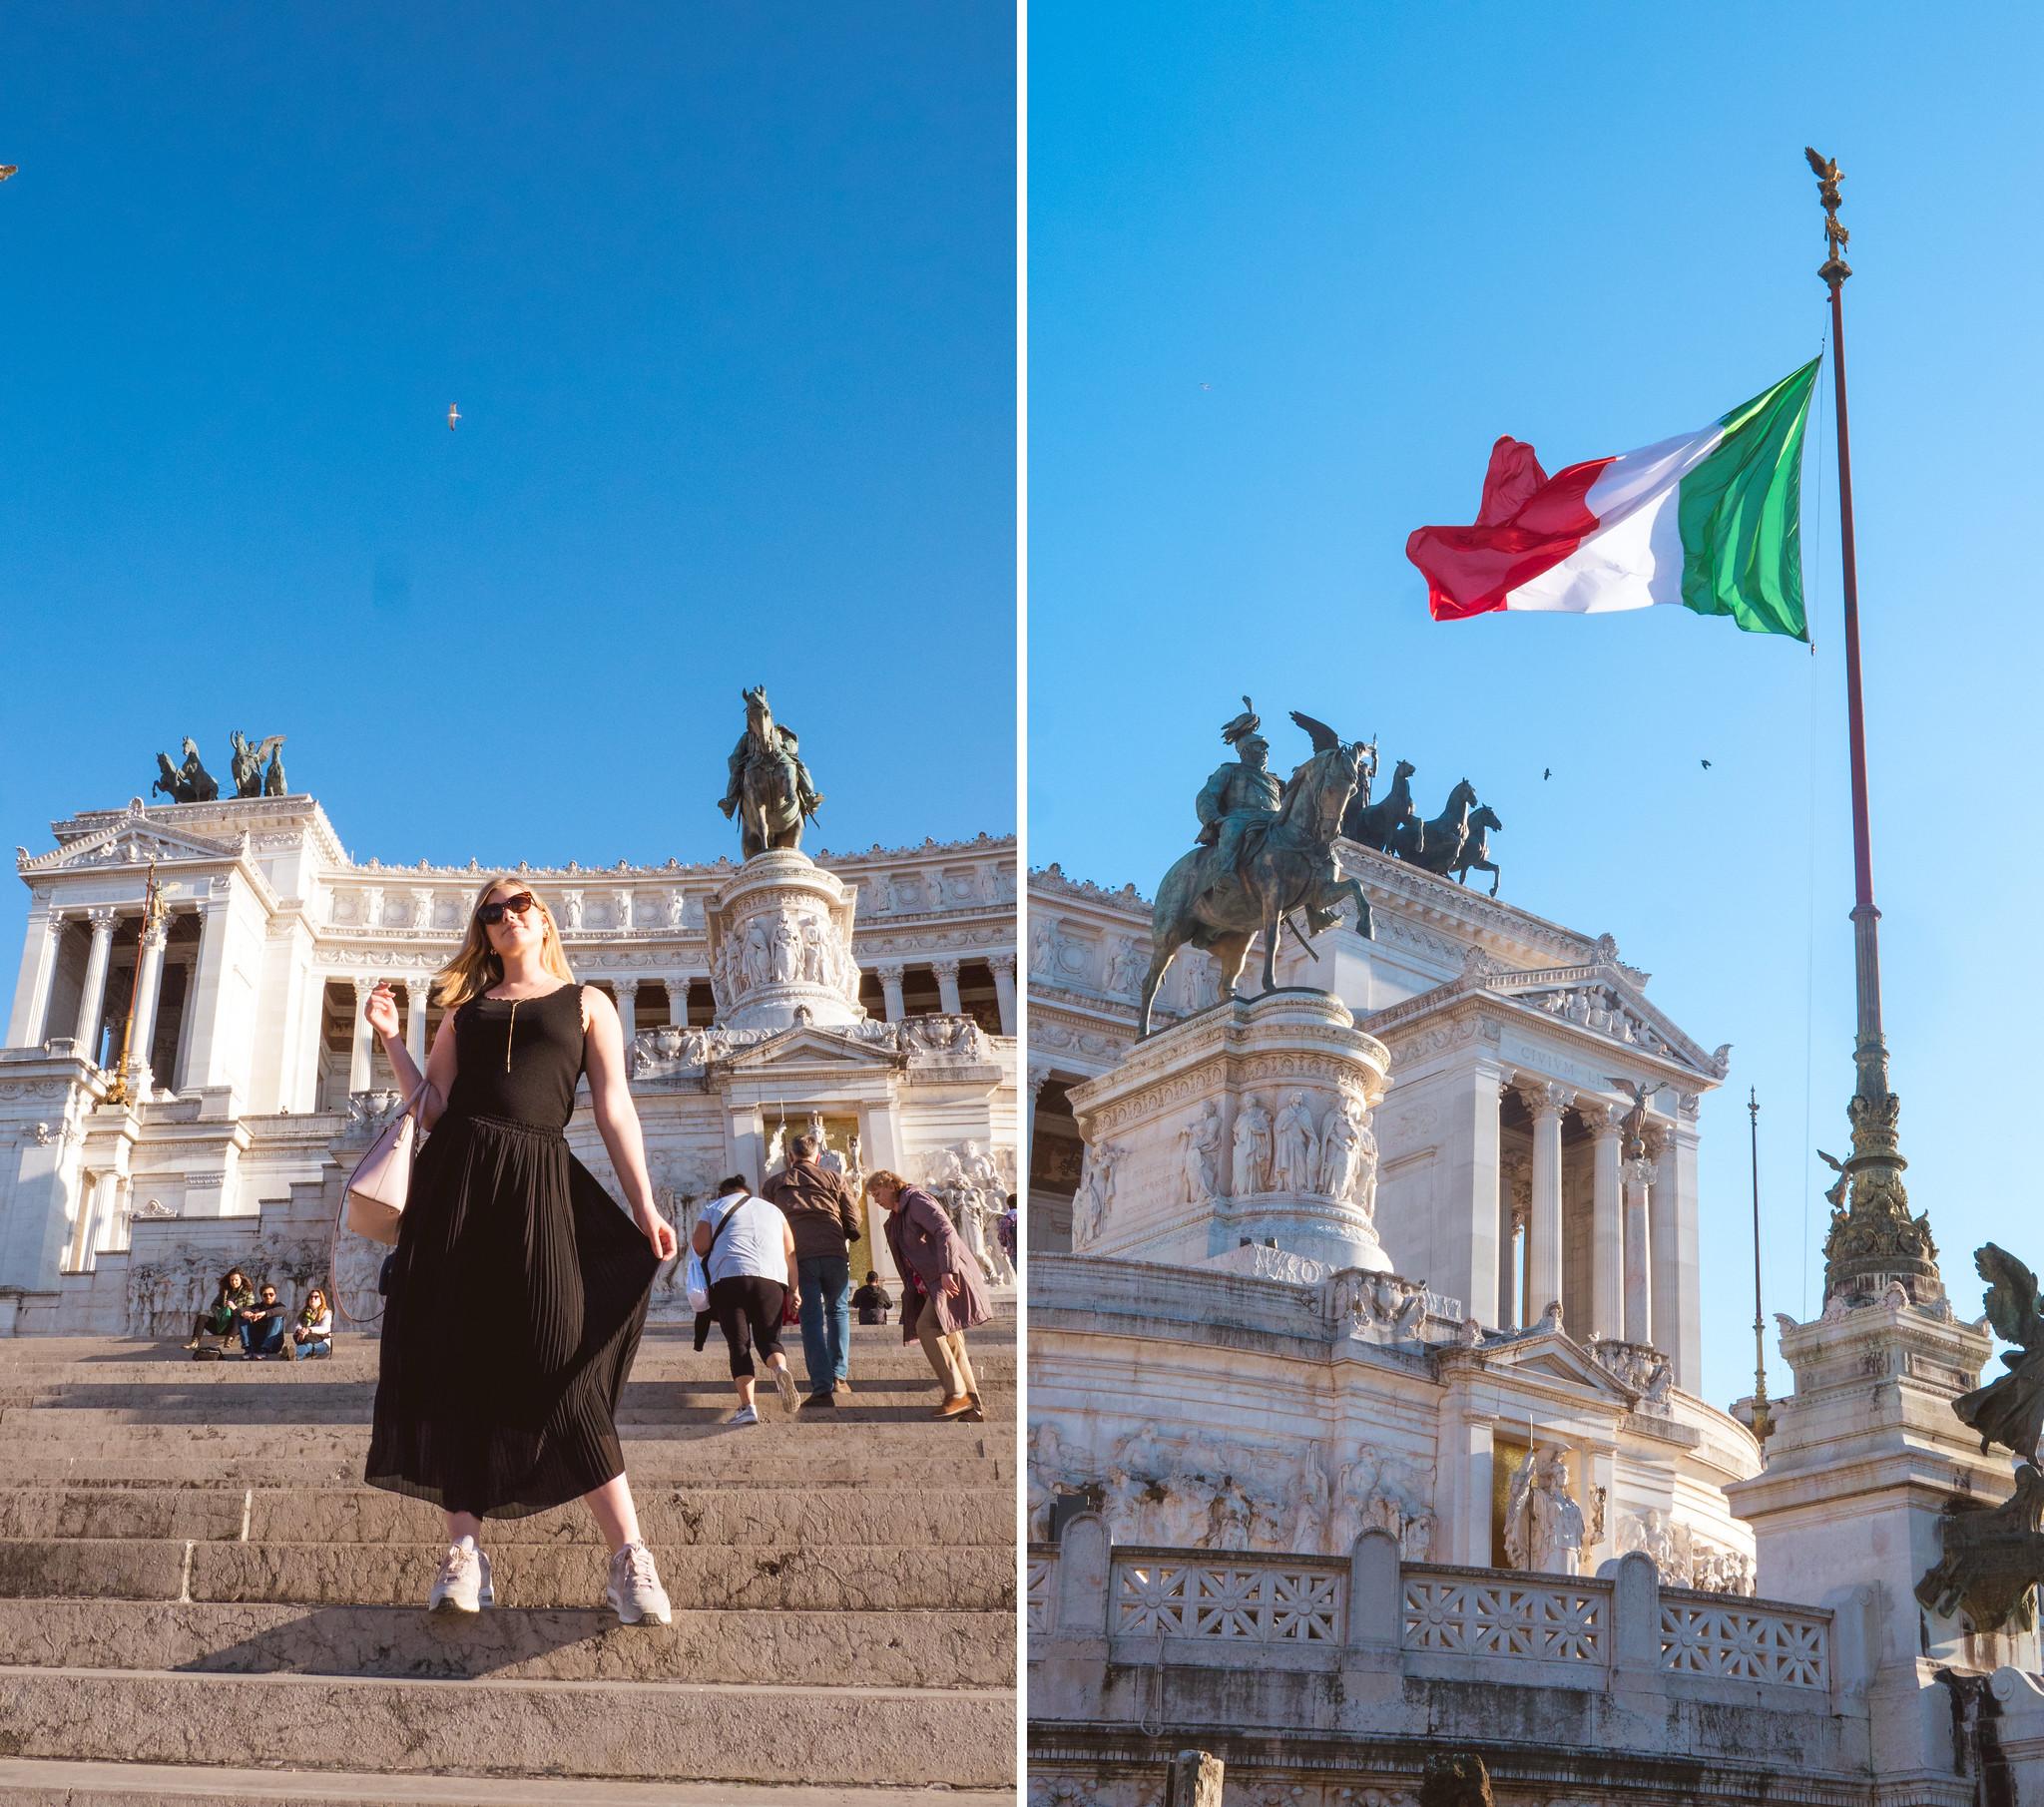 Rooma-Piazza Venezia